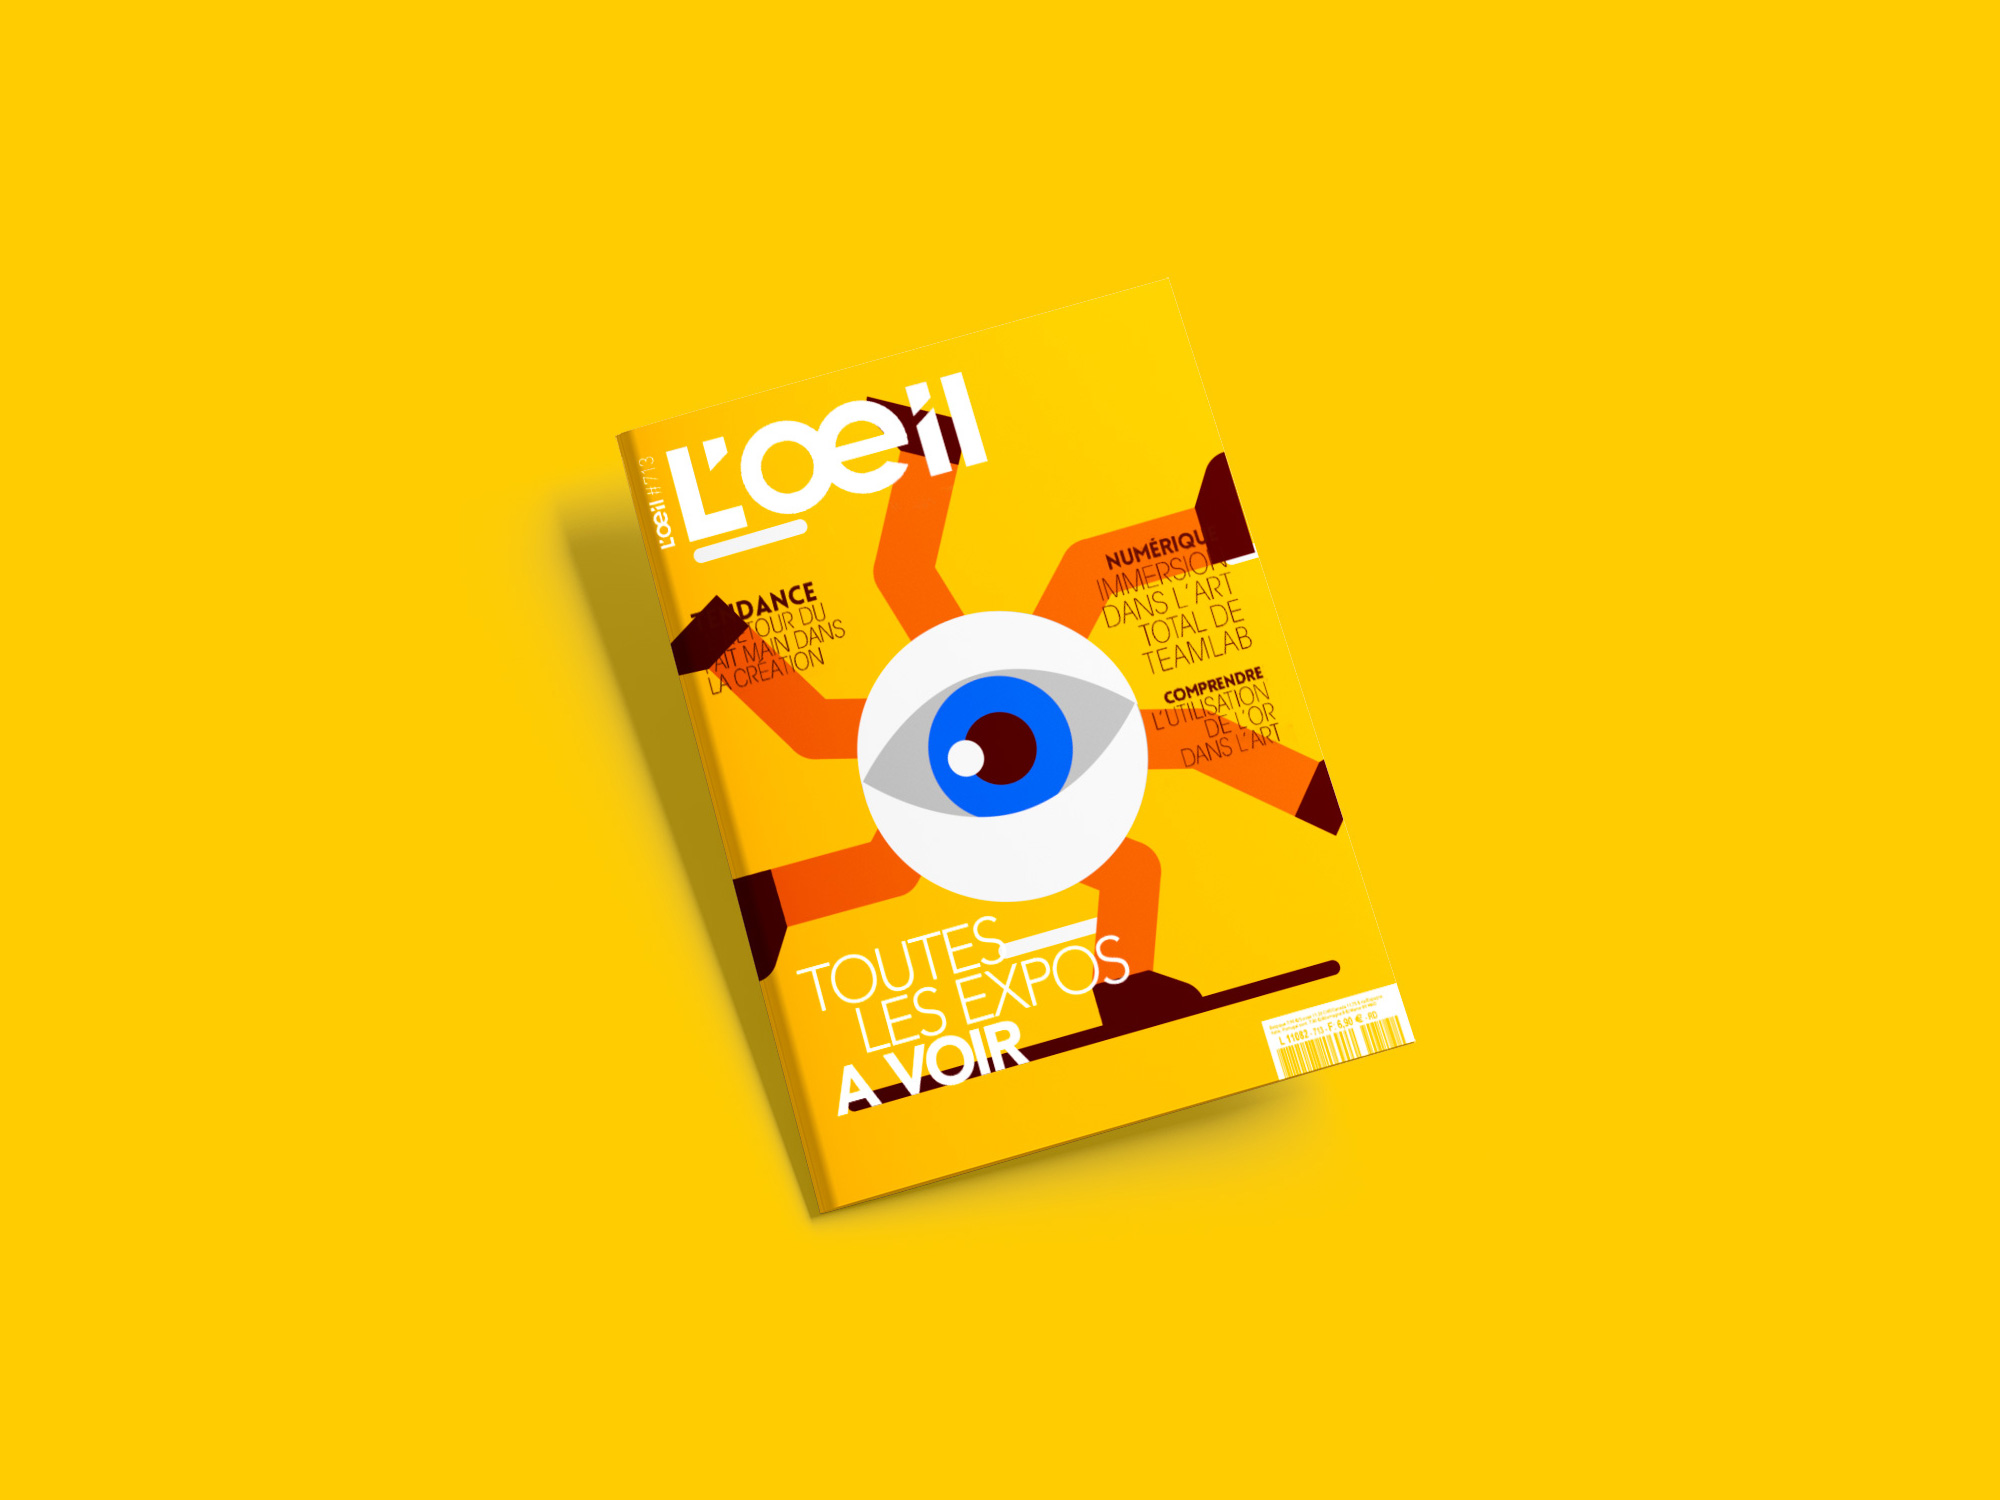 Oeil magazine